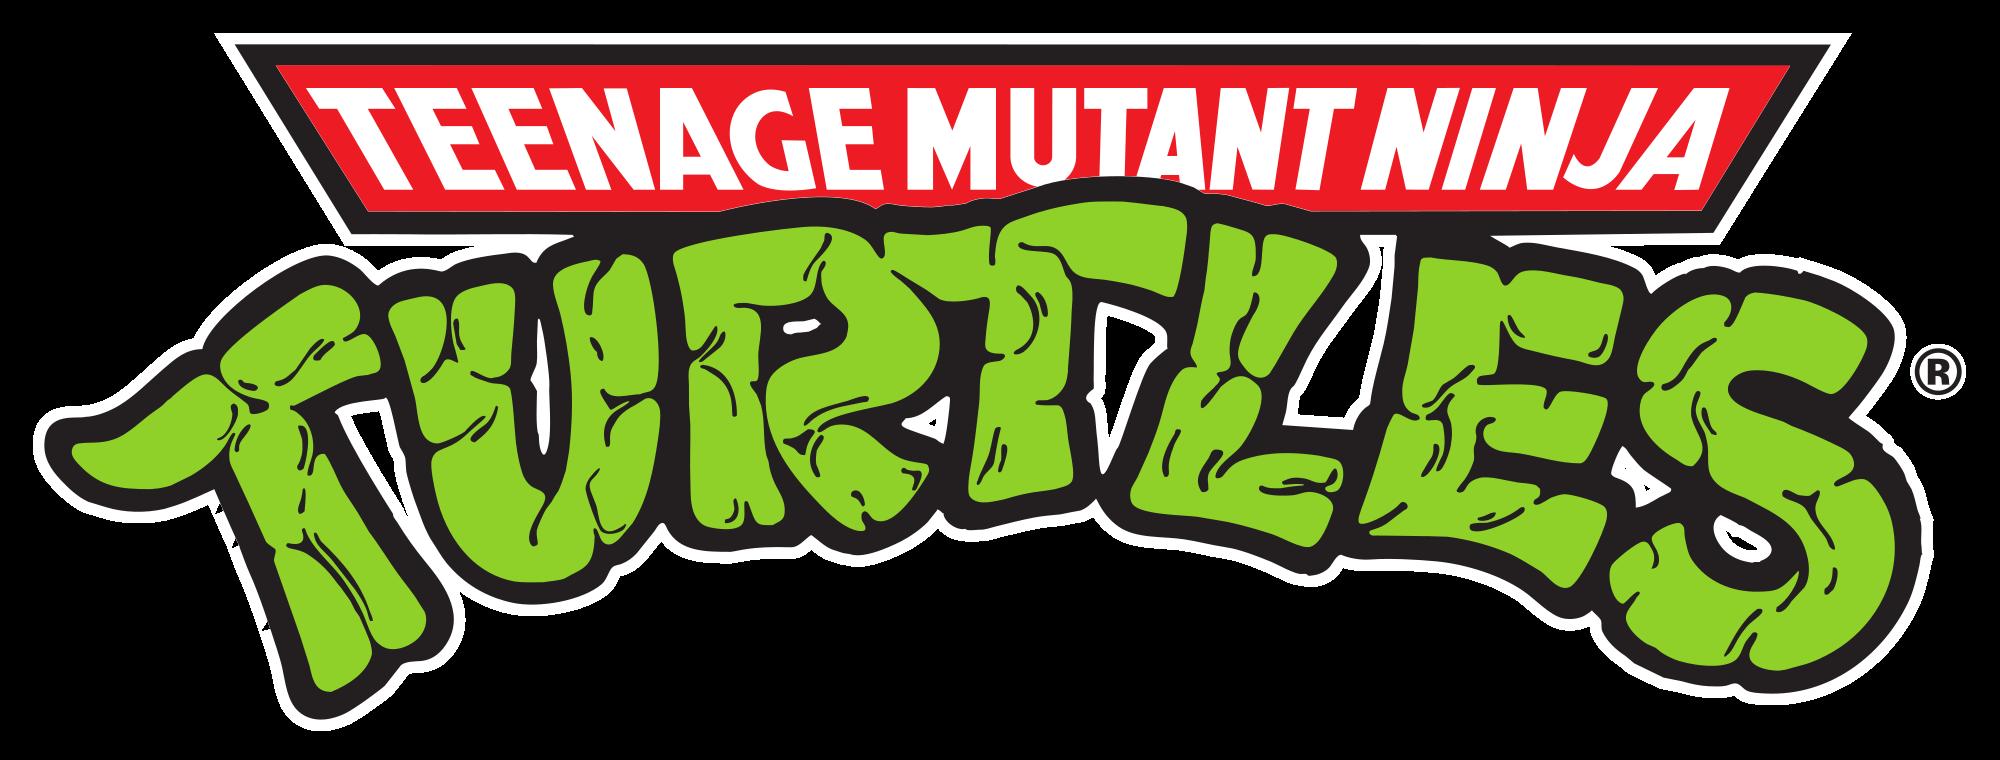 Logo clipart ninja turtle Ninja download Turtles logo Ninja